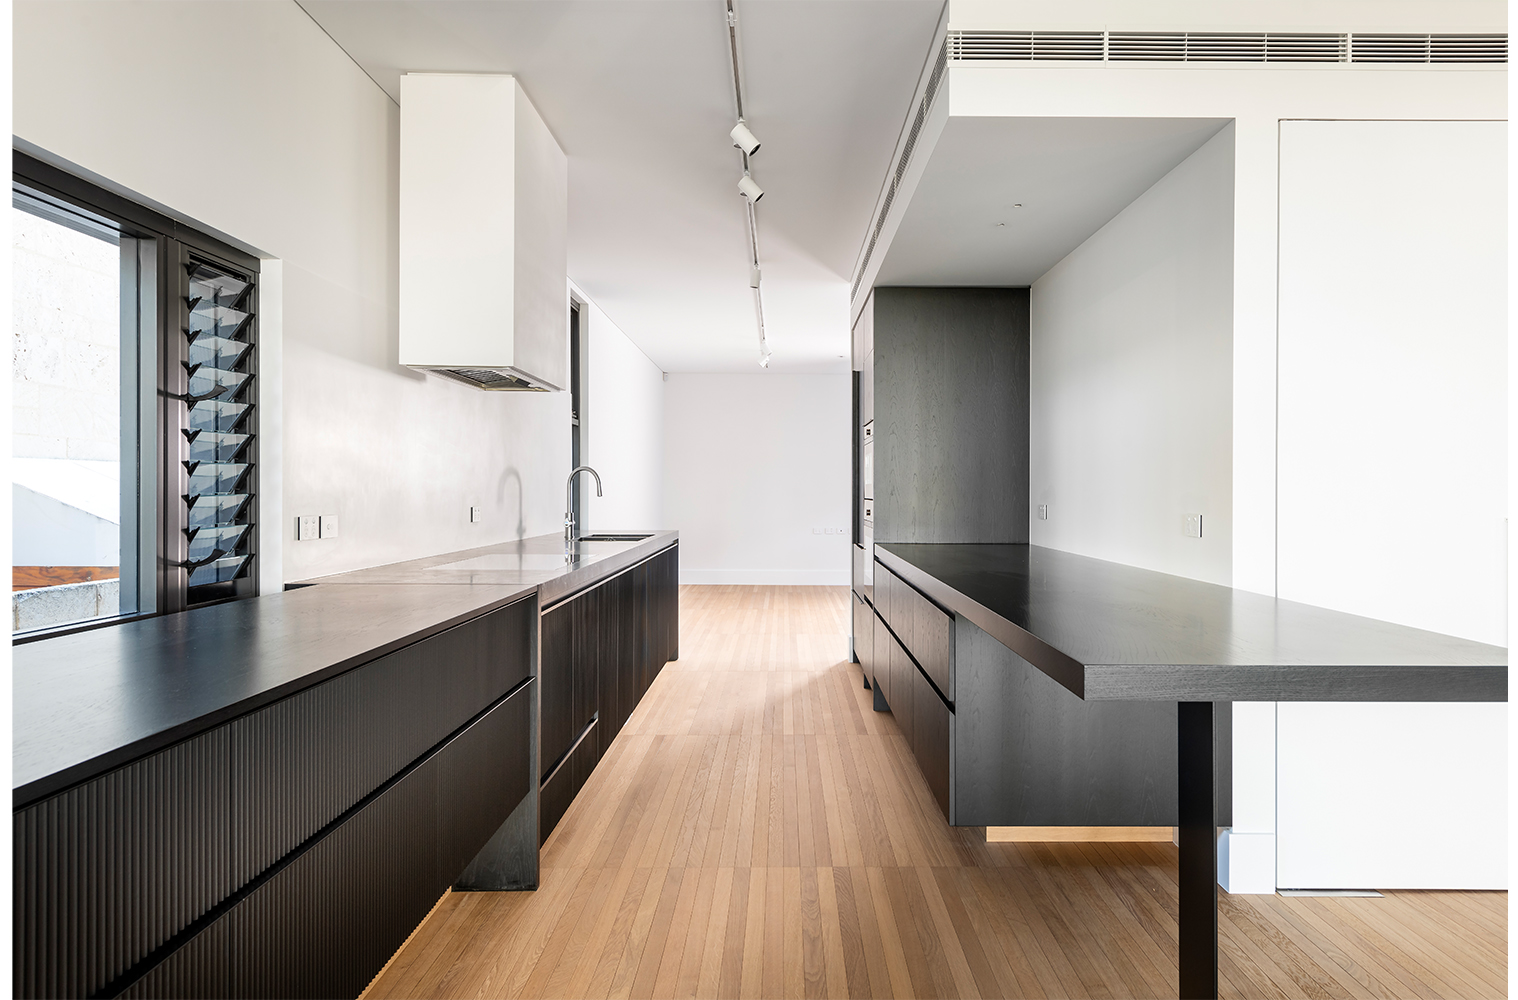 maek-luxury-home-design-inspiration-mosman-park-kitchen-7.jpg